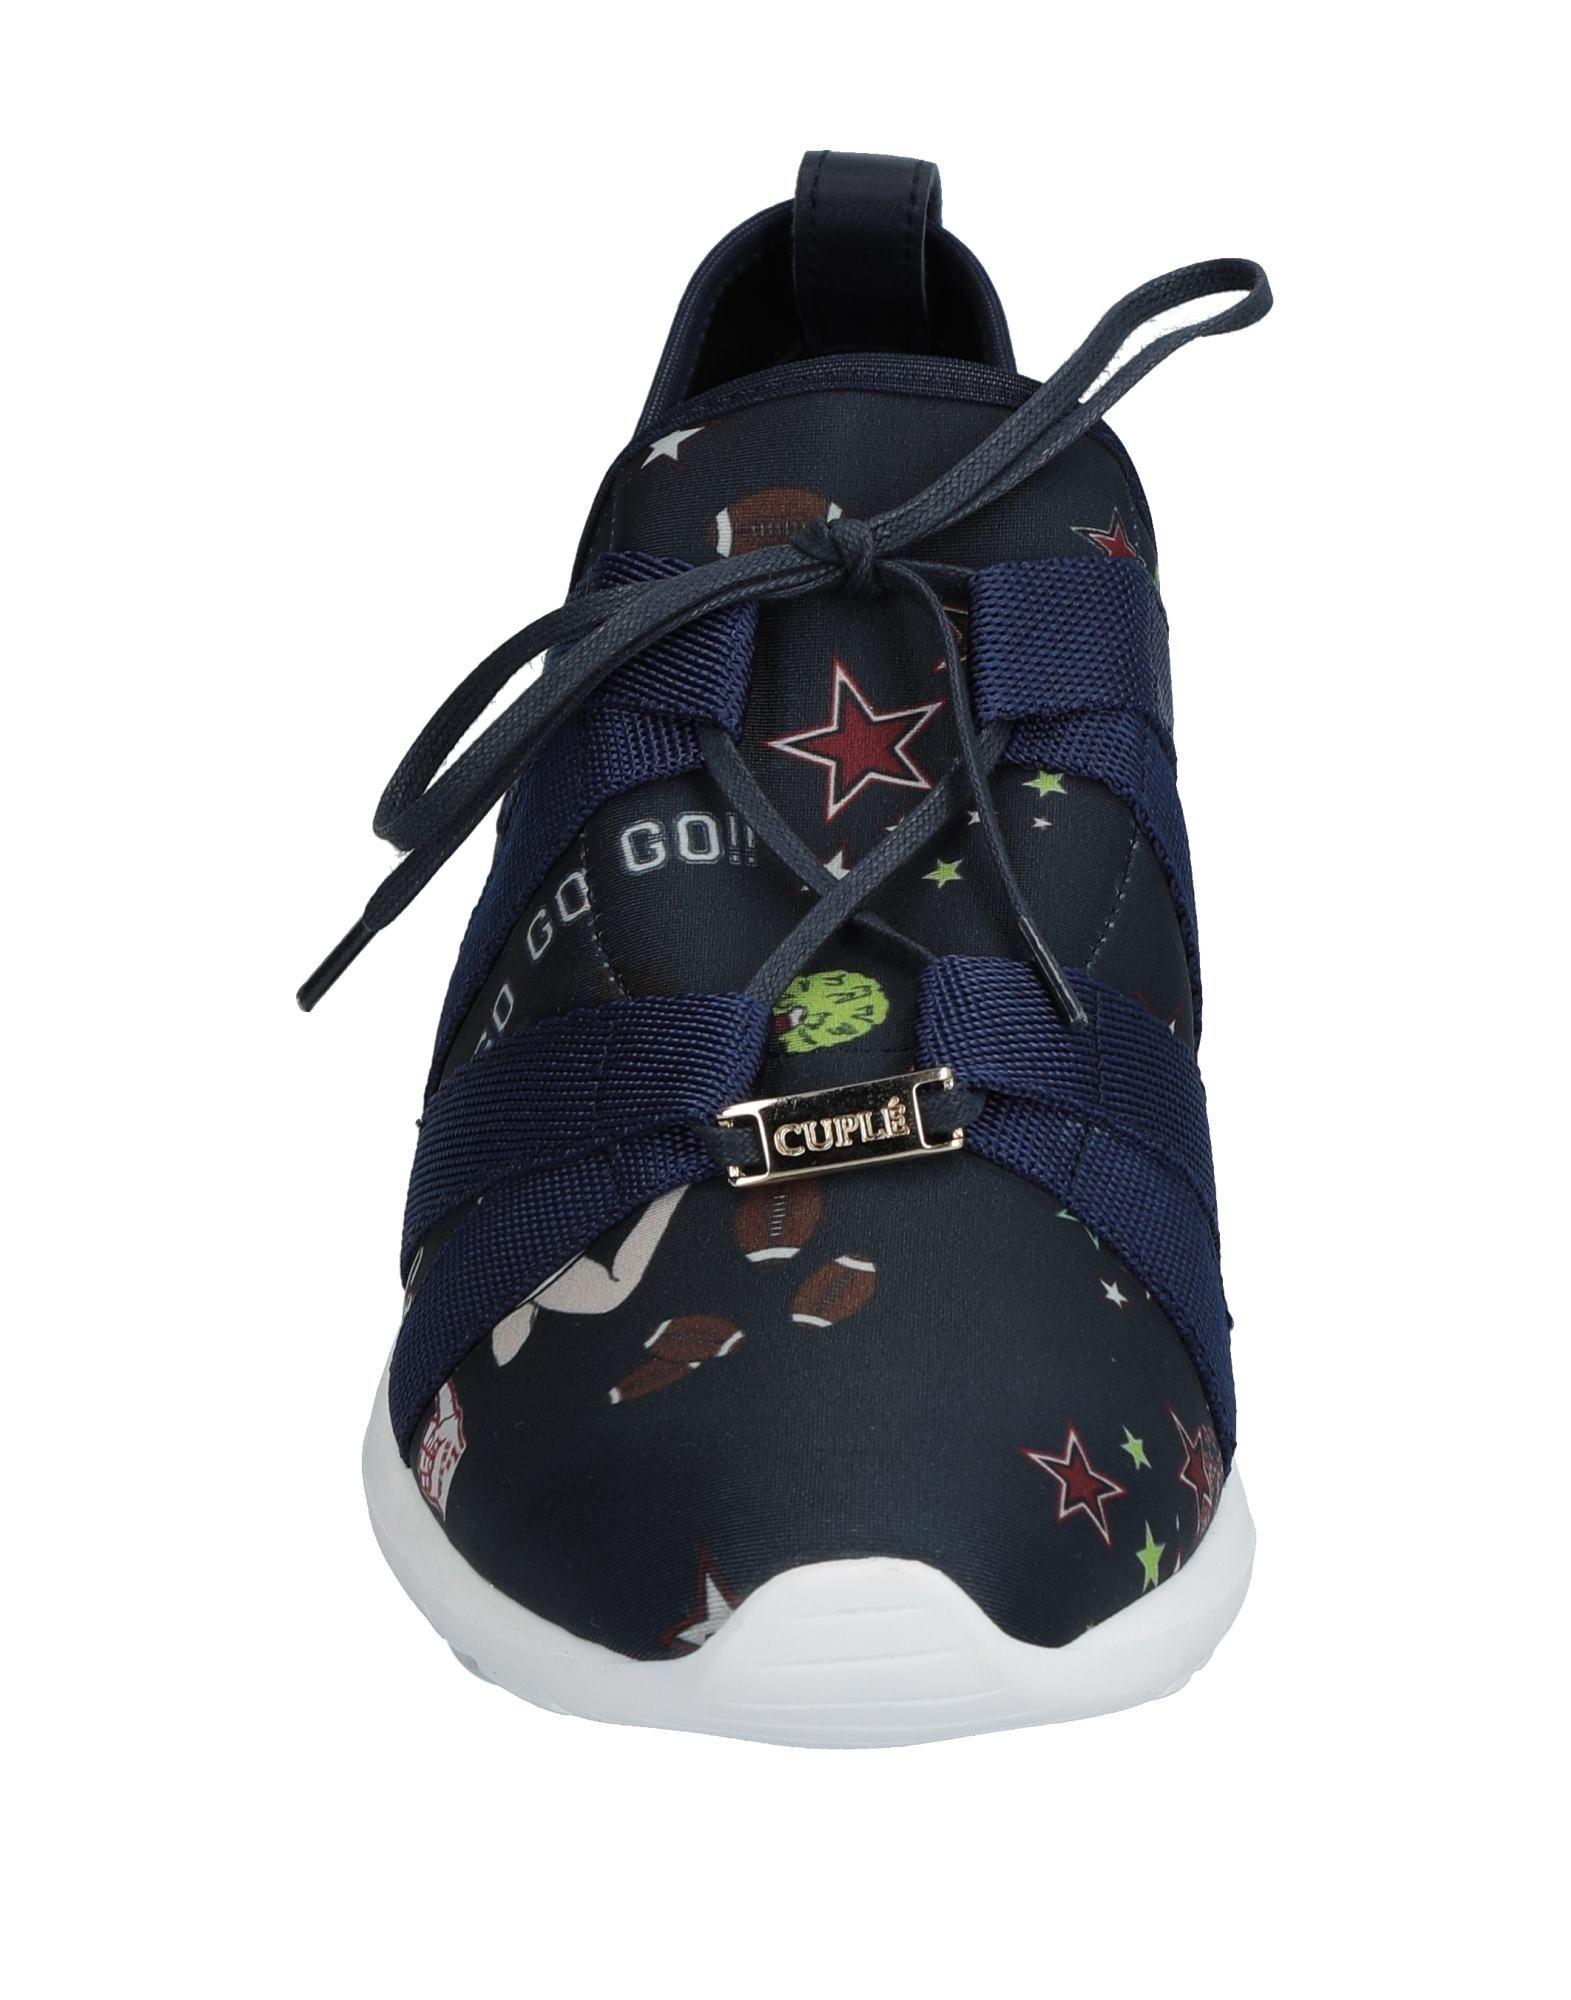 Cuplé Sneakers 11543038UL Damen  11543038UL Sneakers Gute Qualität beliebte Schuhe 94394d